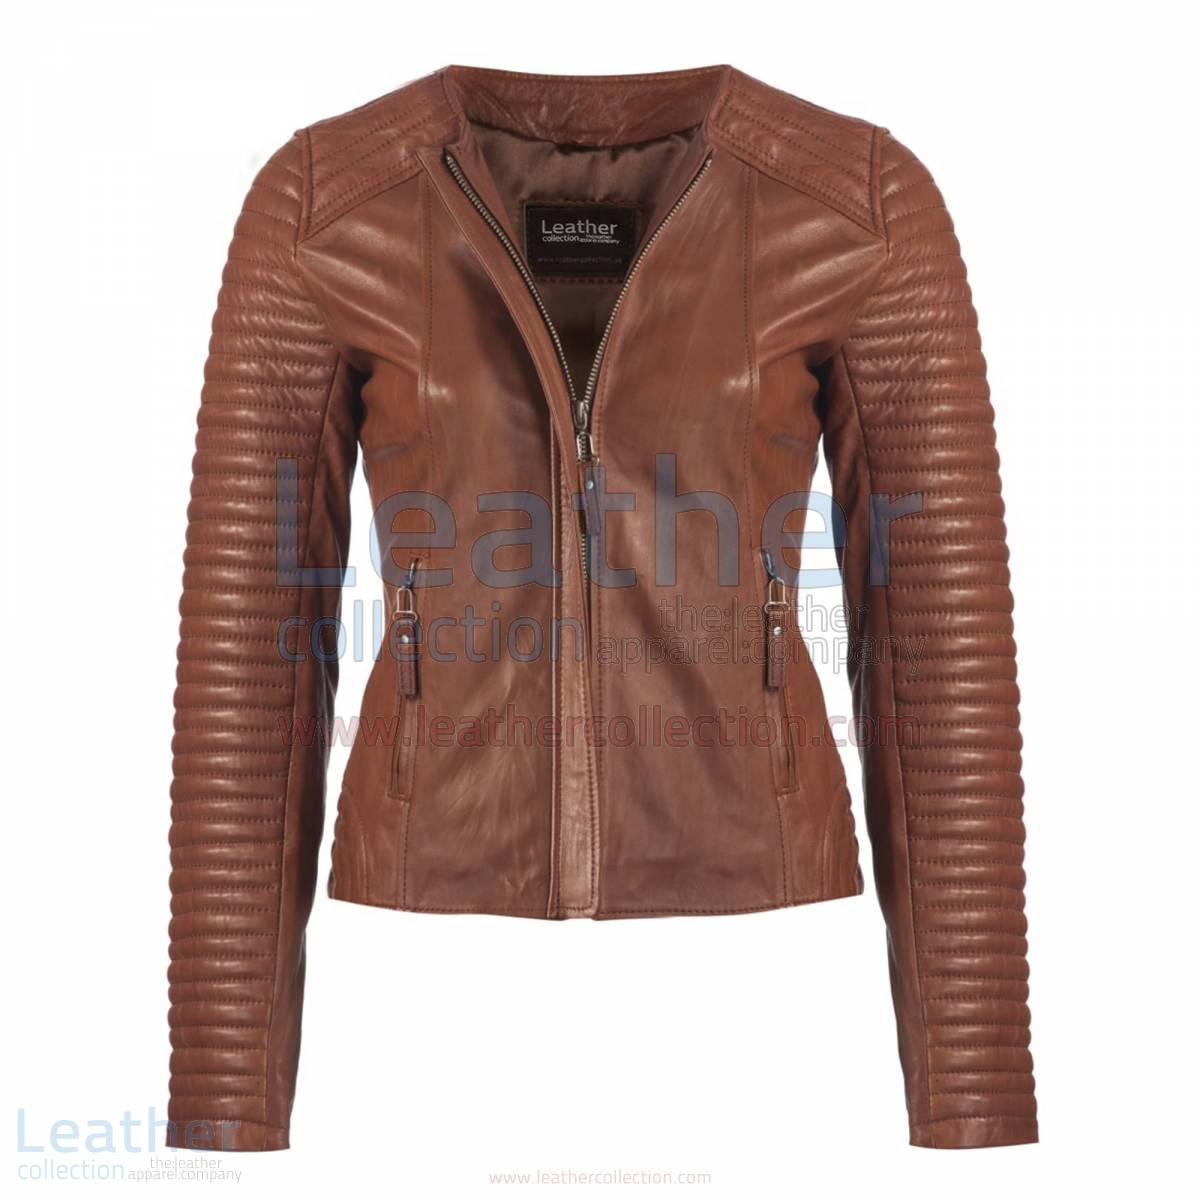 Ladies Legacy Leather Jacket